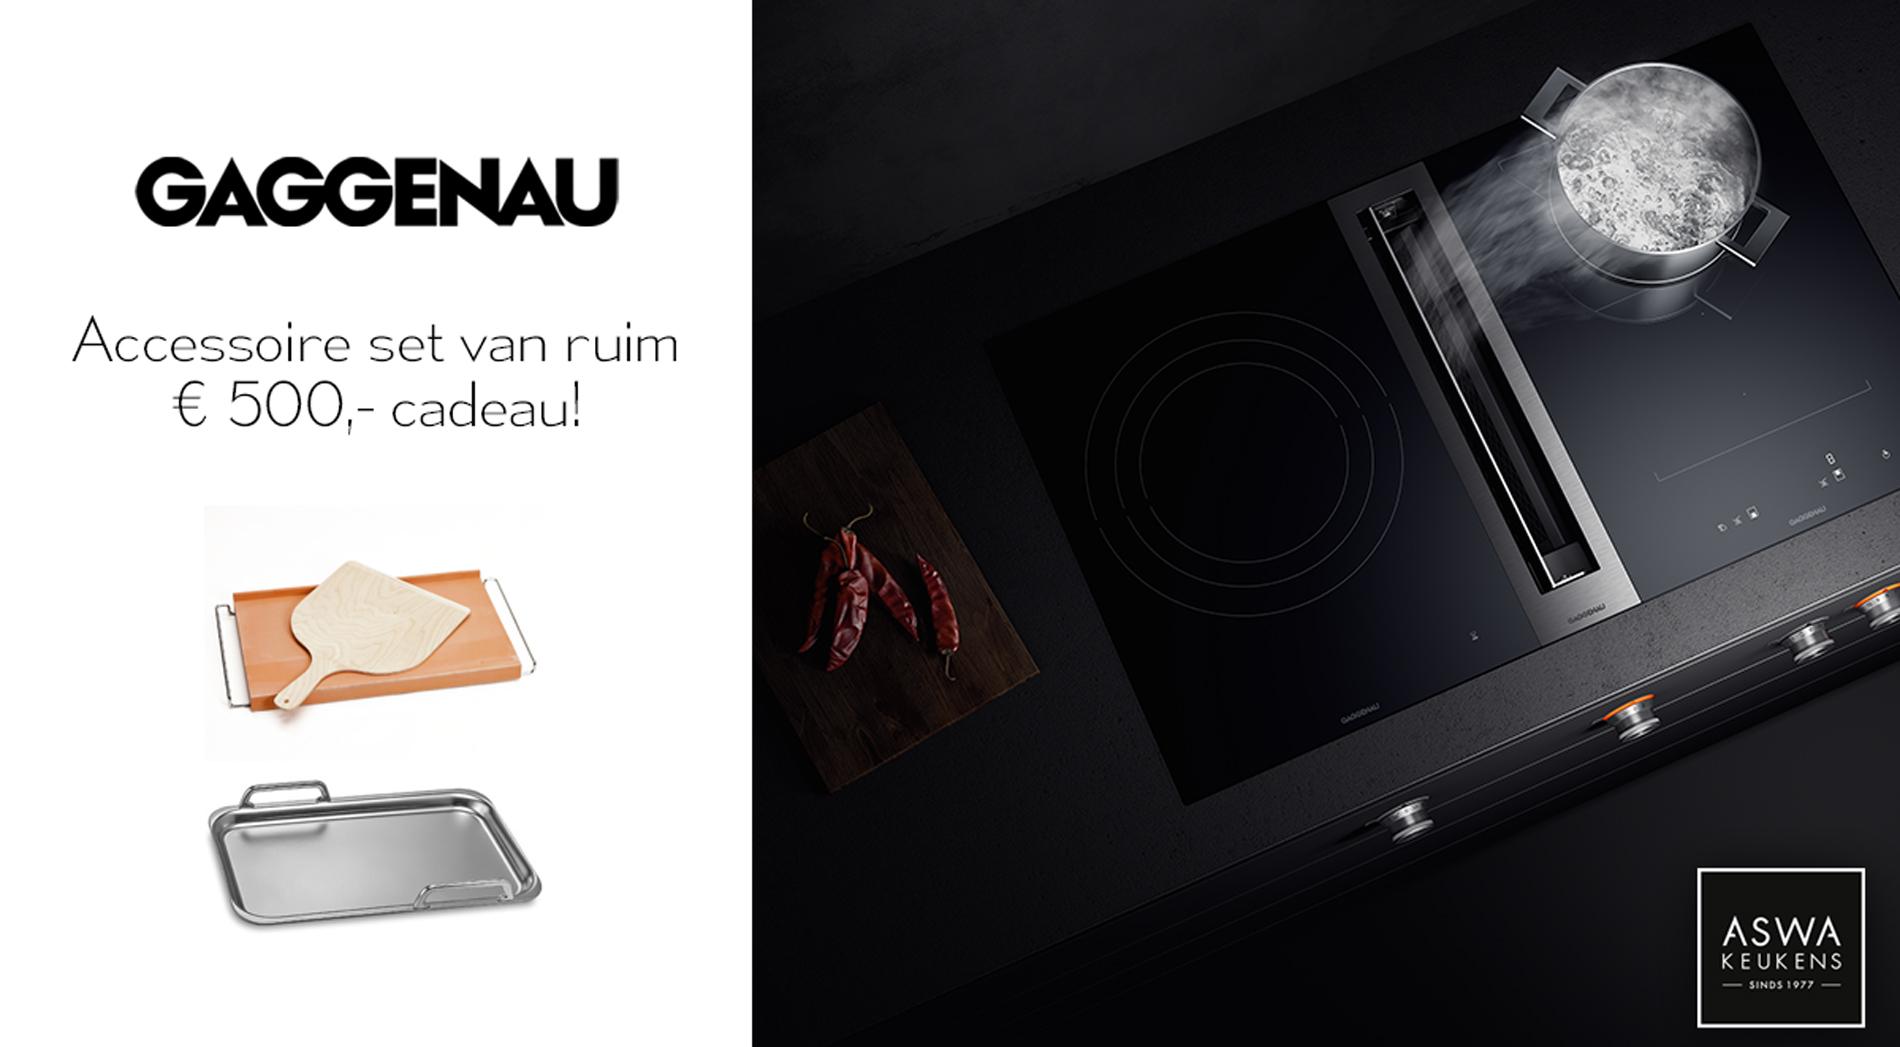 Actie - Gaggenau accessoire set van ruim € 500,- cadeau